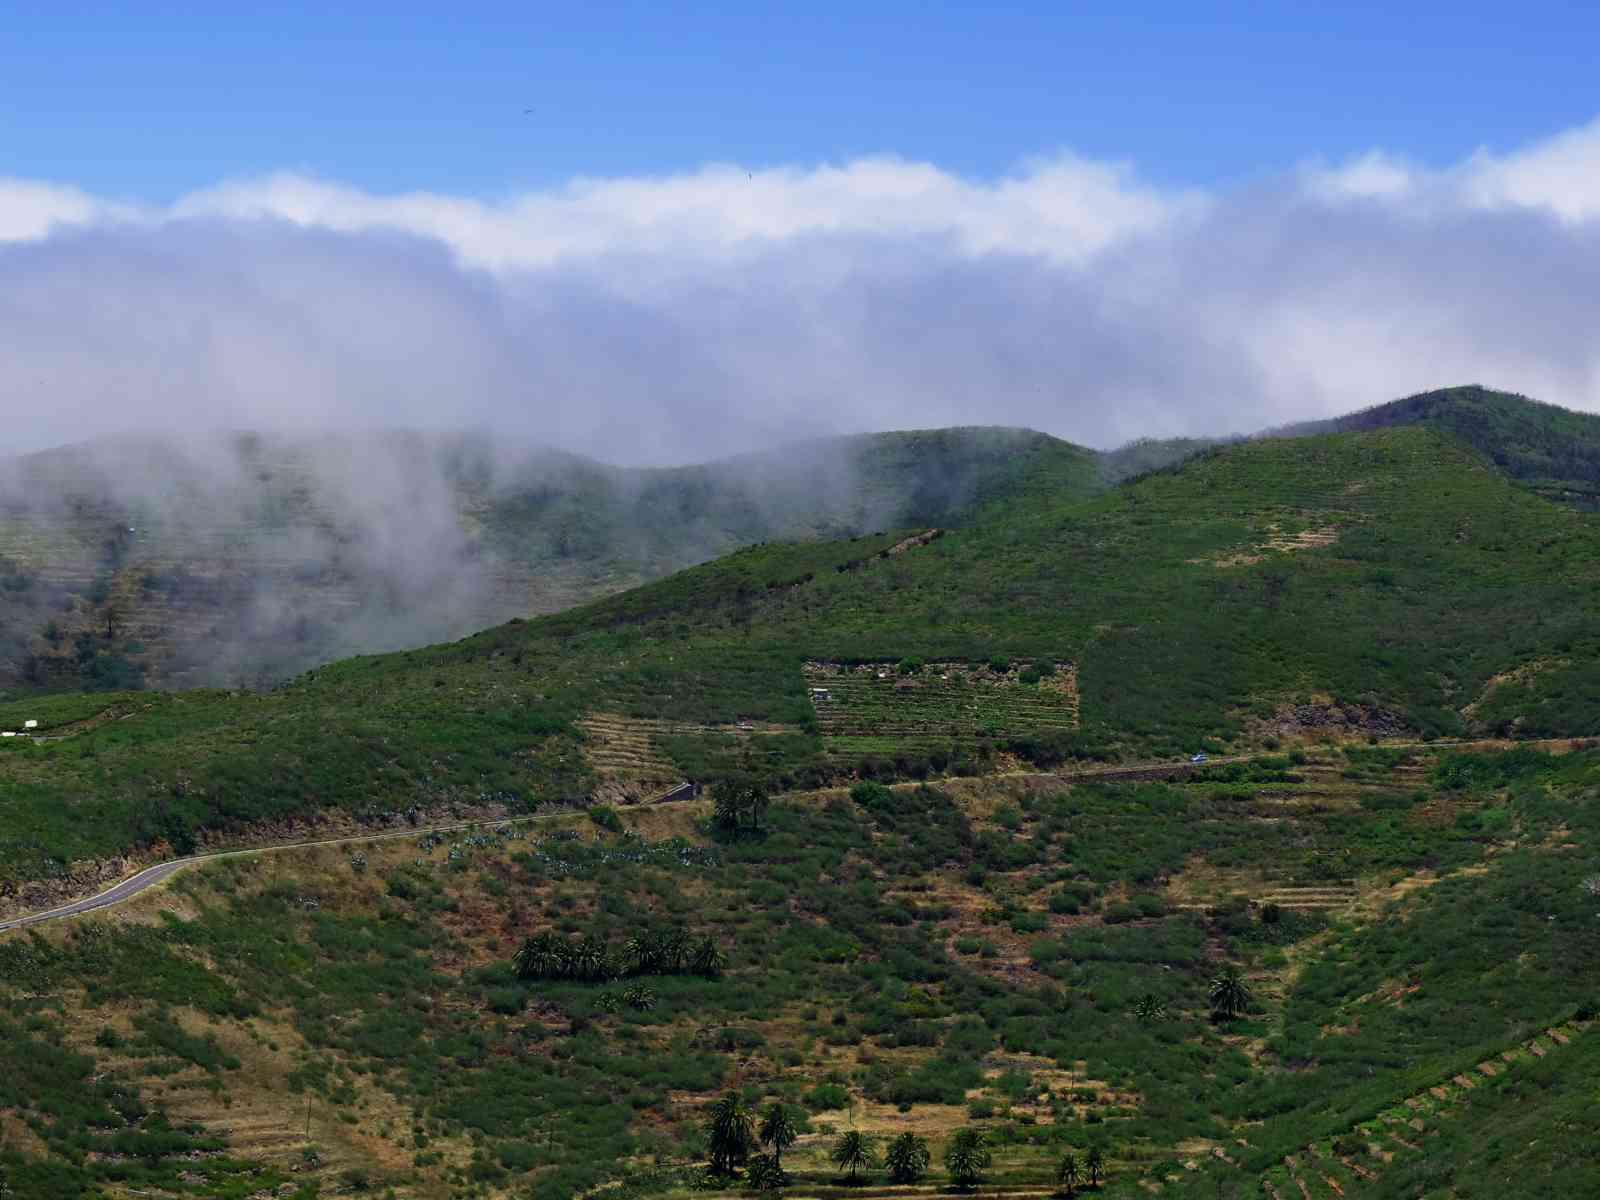 La Fortaleza - Über den Wolken